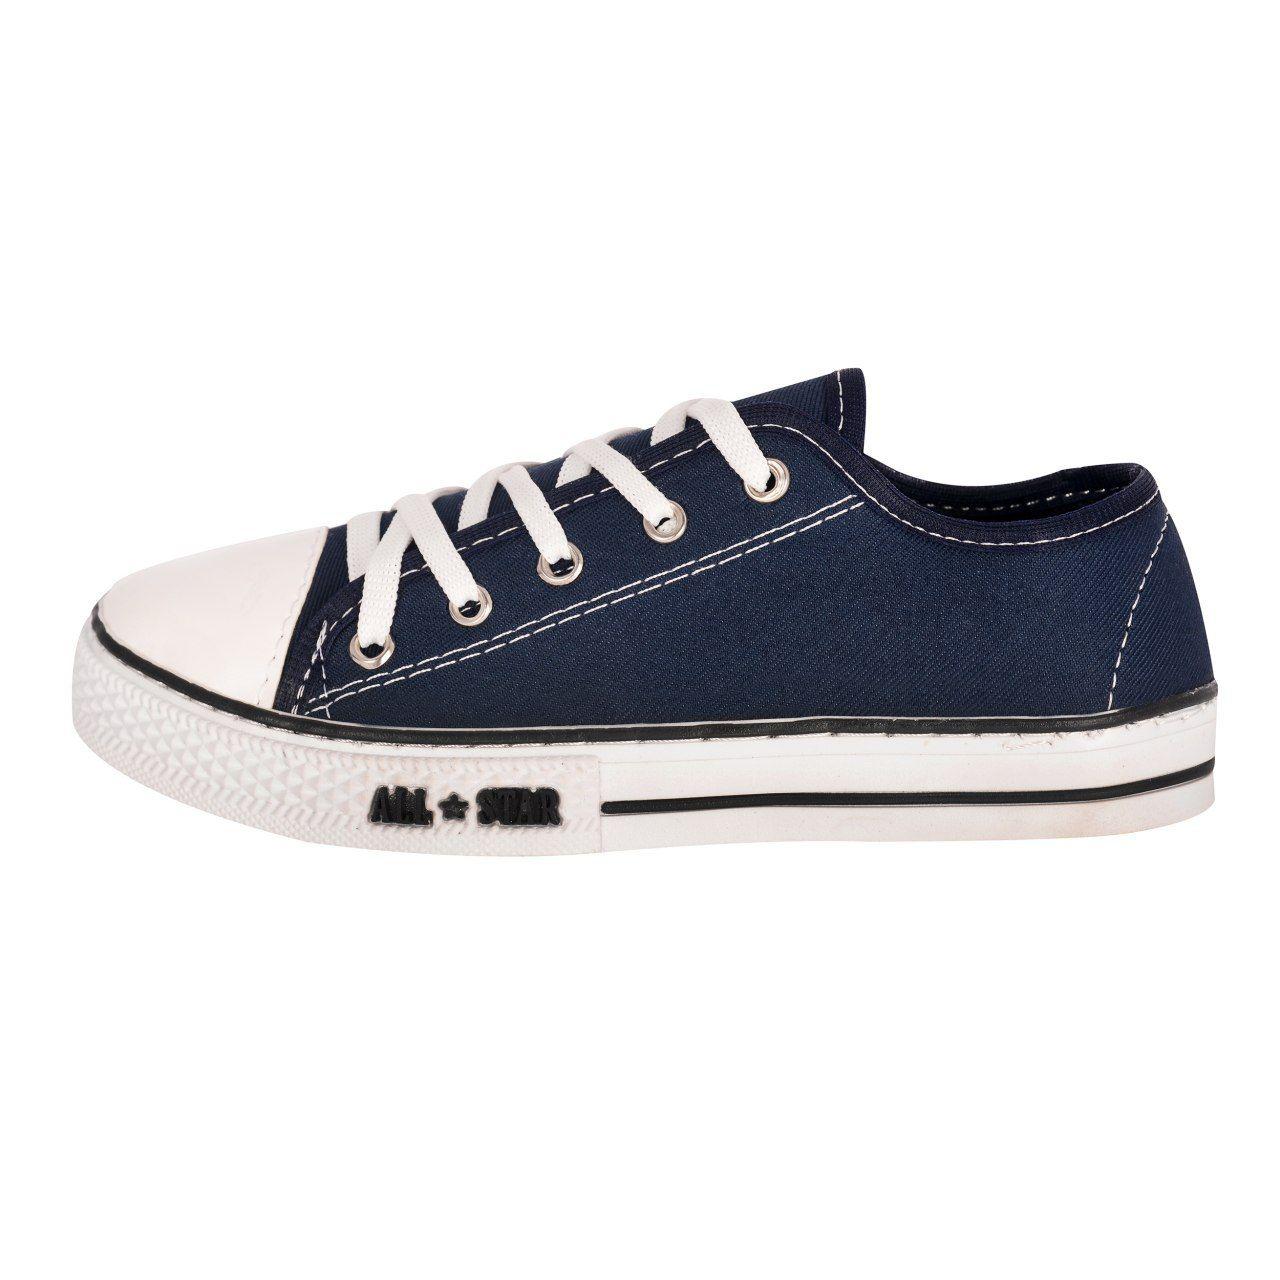 کفش راحتی دخترانه کد A_4                     غیر اصل